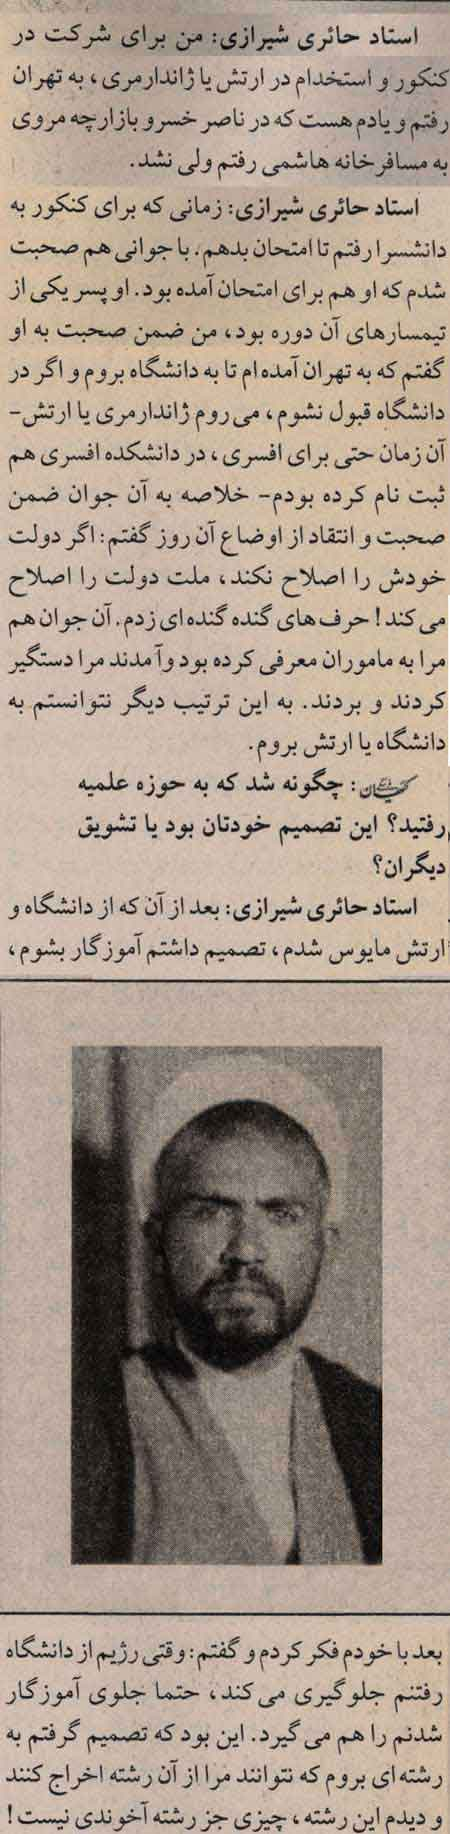 https://i1.wp.com/www.shahbazi.org/images/Freemasonry_Sassoons14.jpg